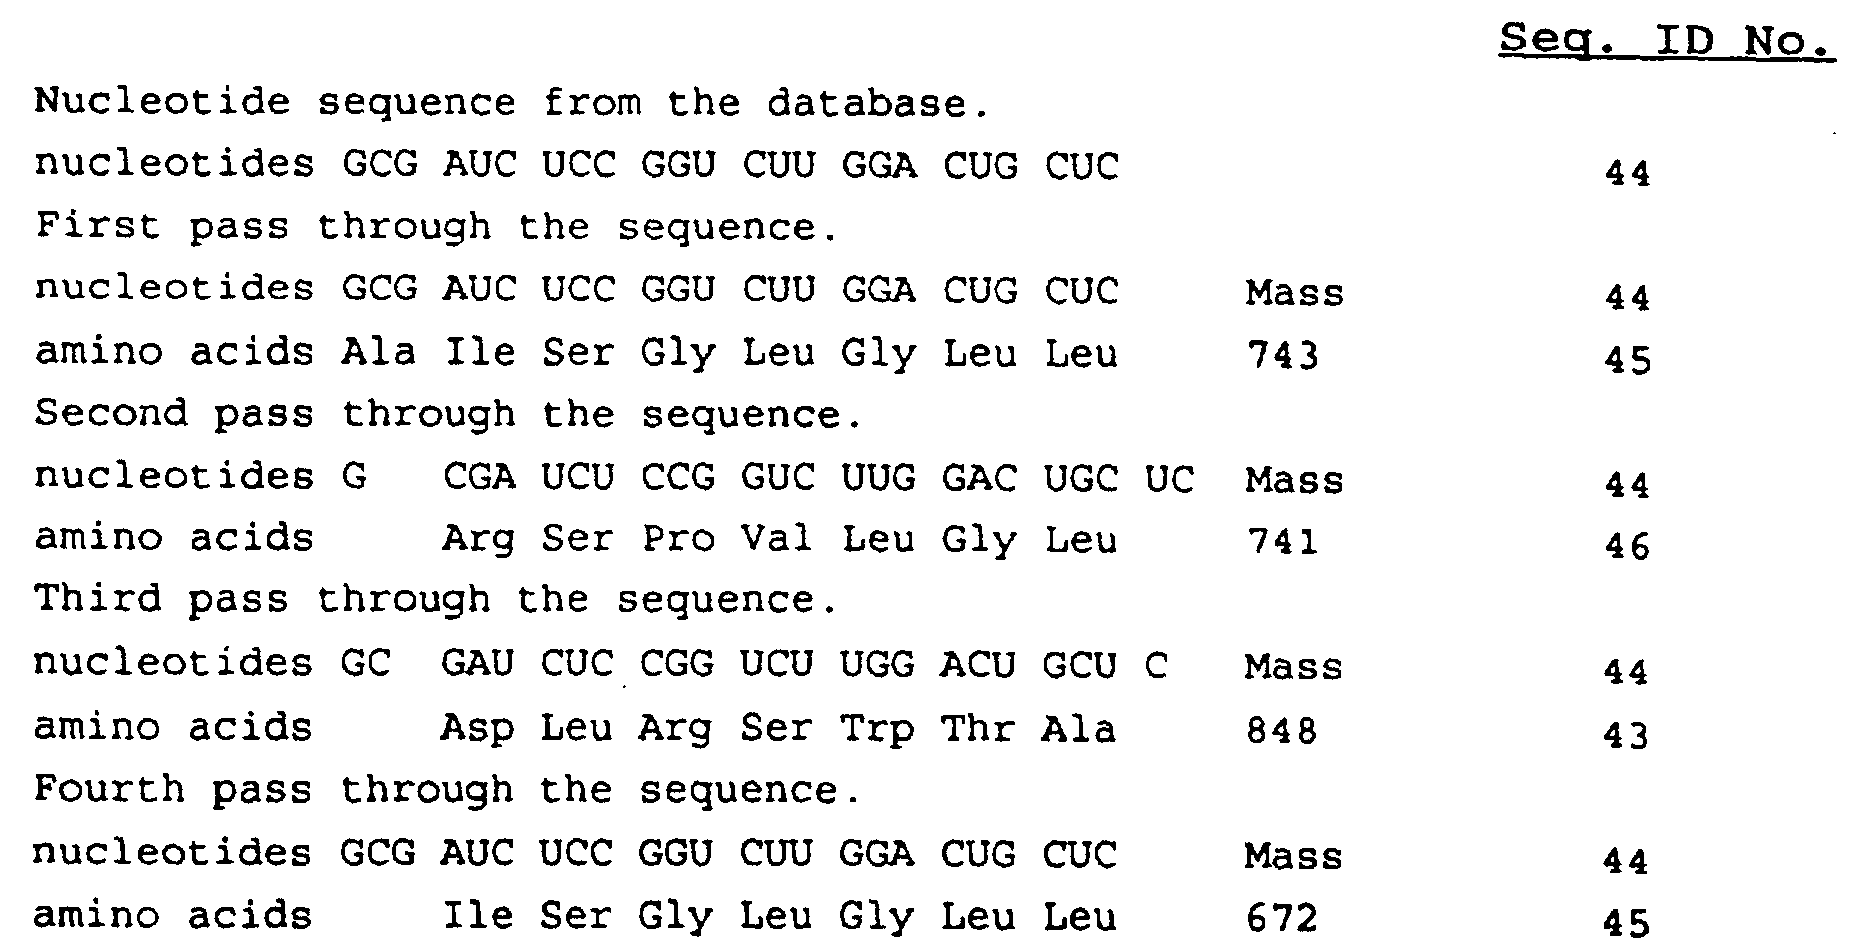 identification of amino acids View lab report - lab 3 separation and identification of amino acids from chem 237 at waterloo separationandidentificationofaminoacids summary.